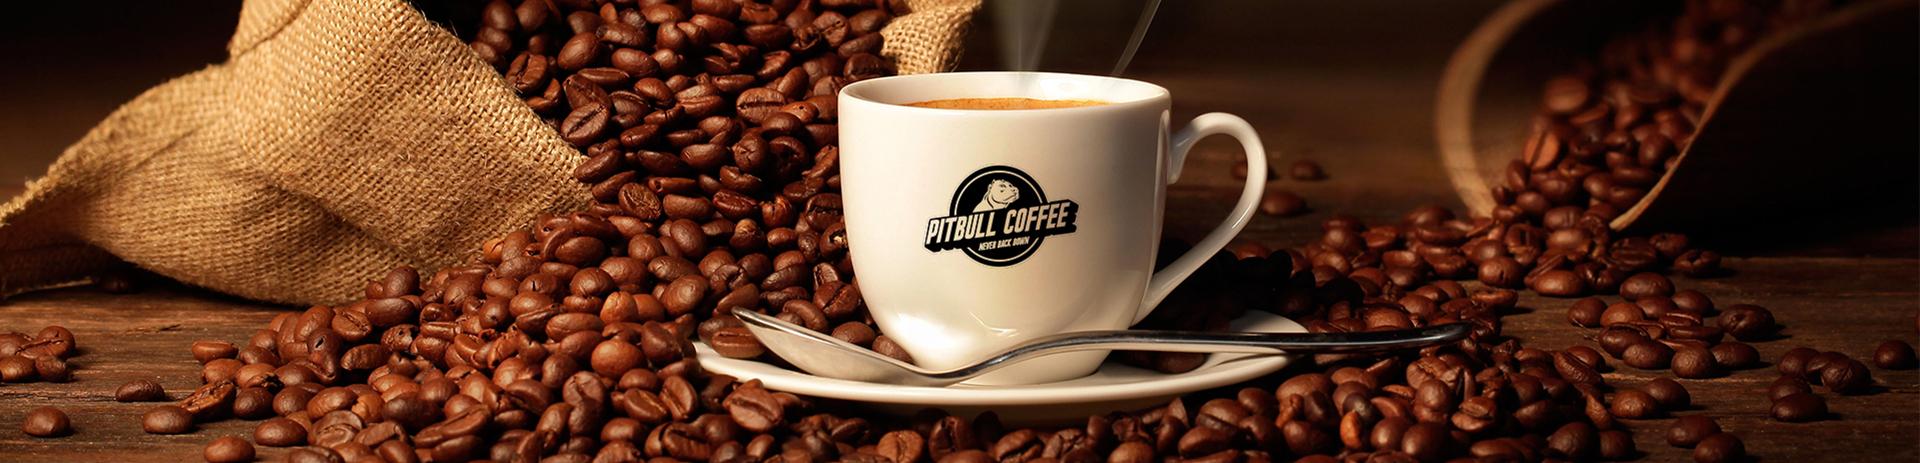 Pitbull Coffee Banner